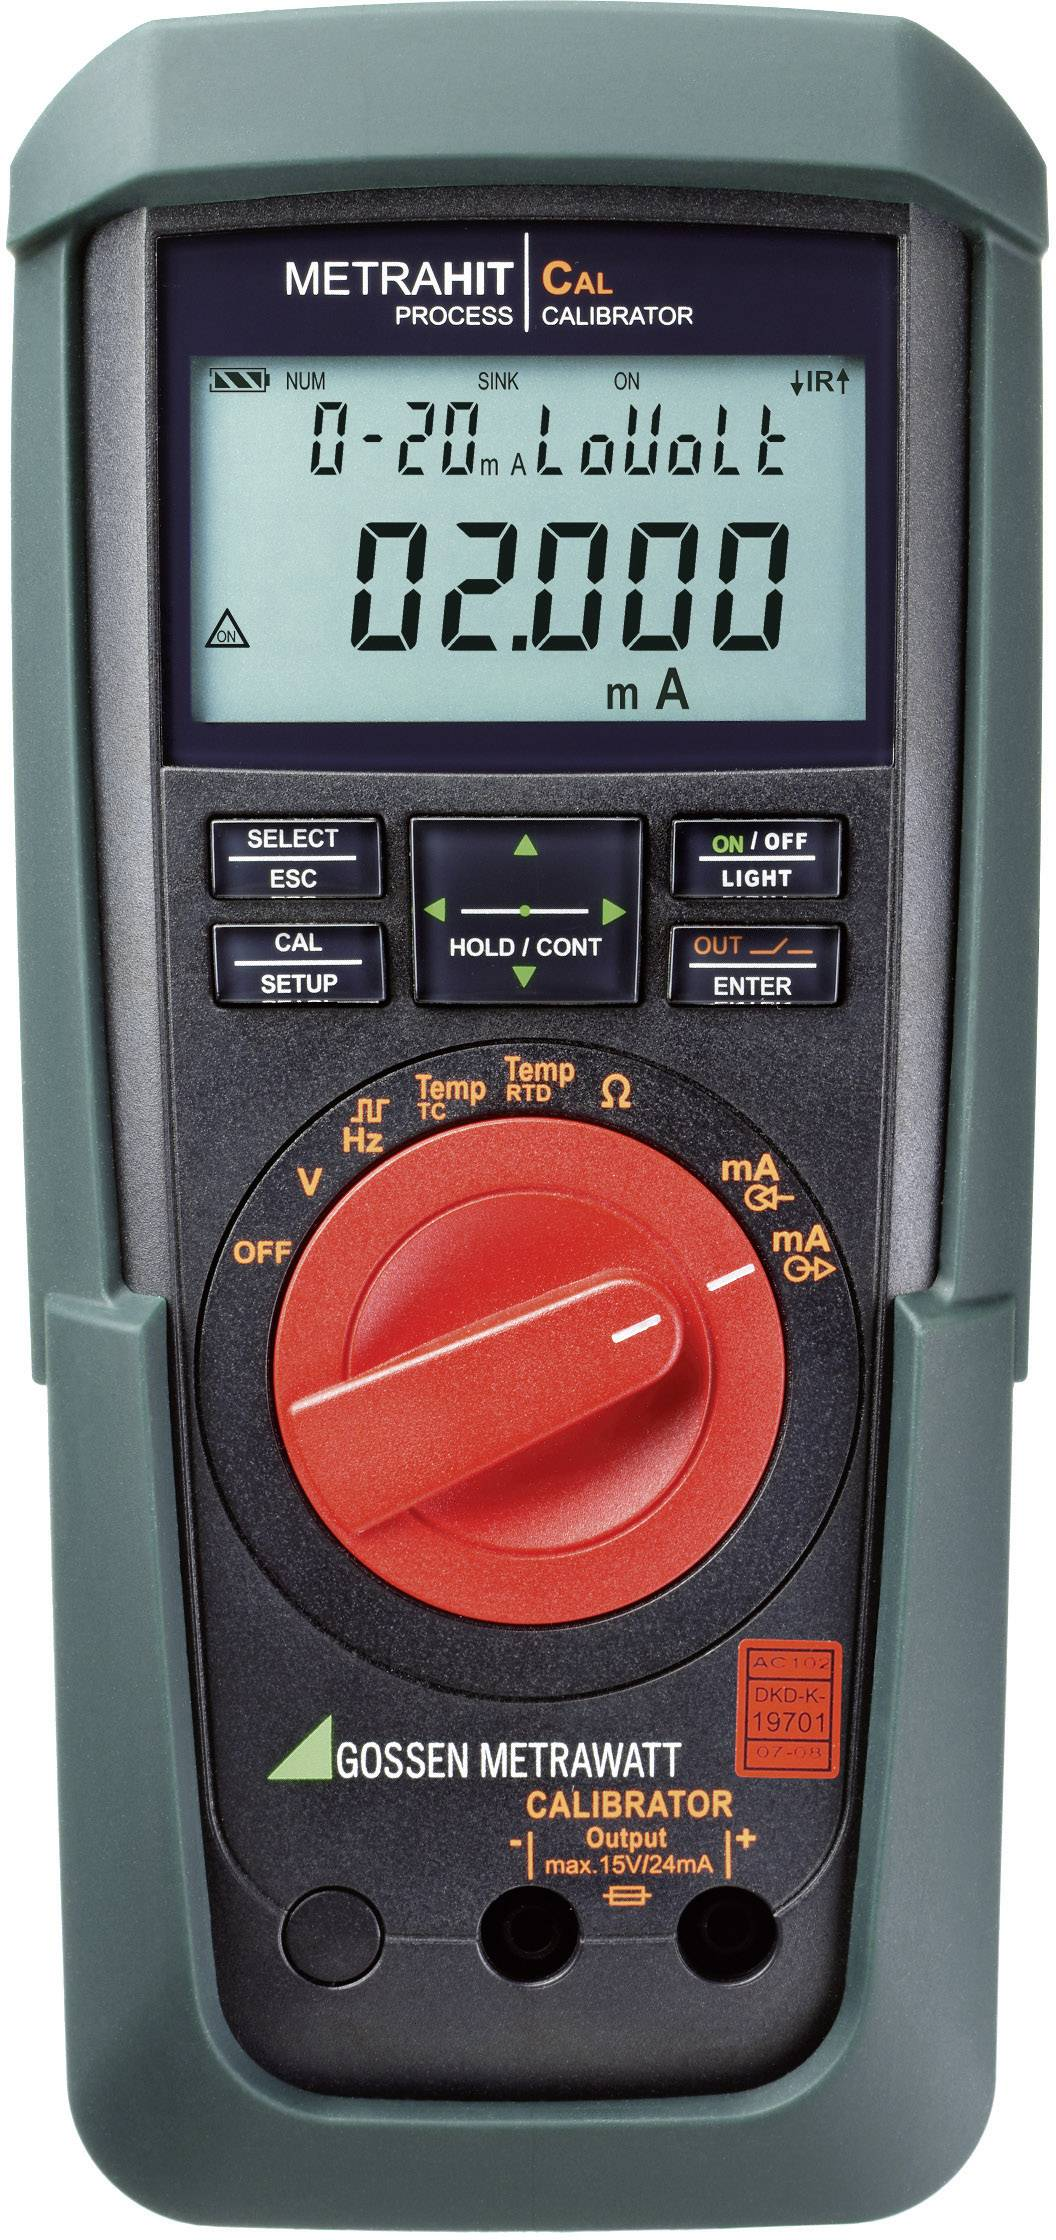 Kalibrátor Gossen Metrawatt METRAHIT CAL, M244A